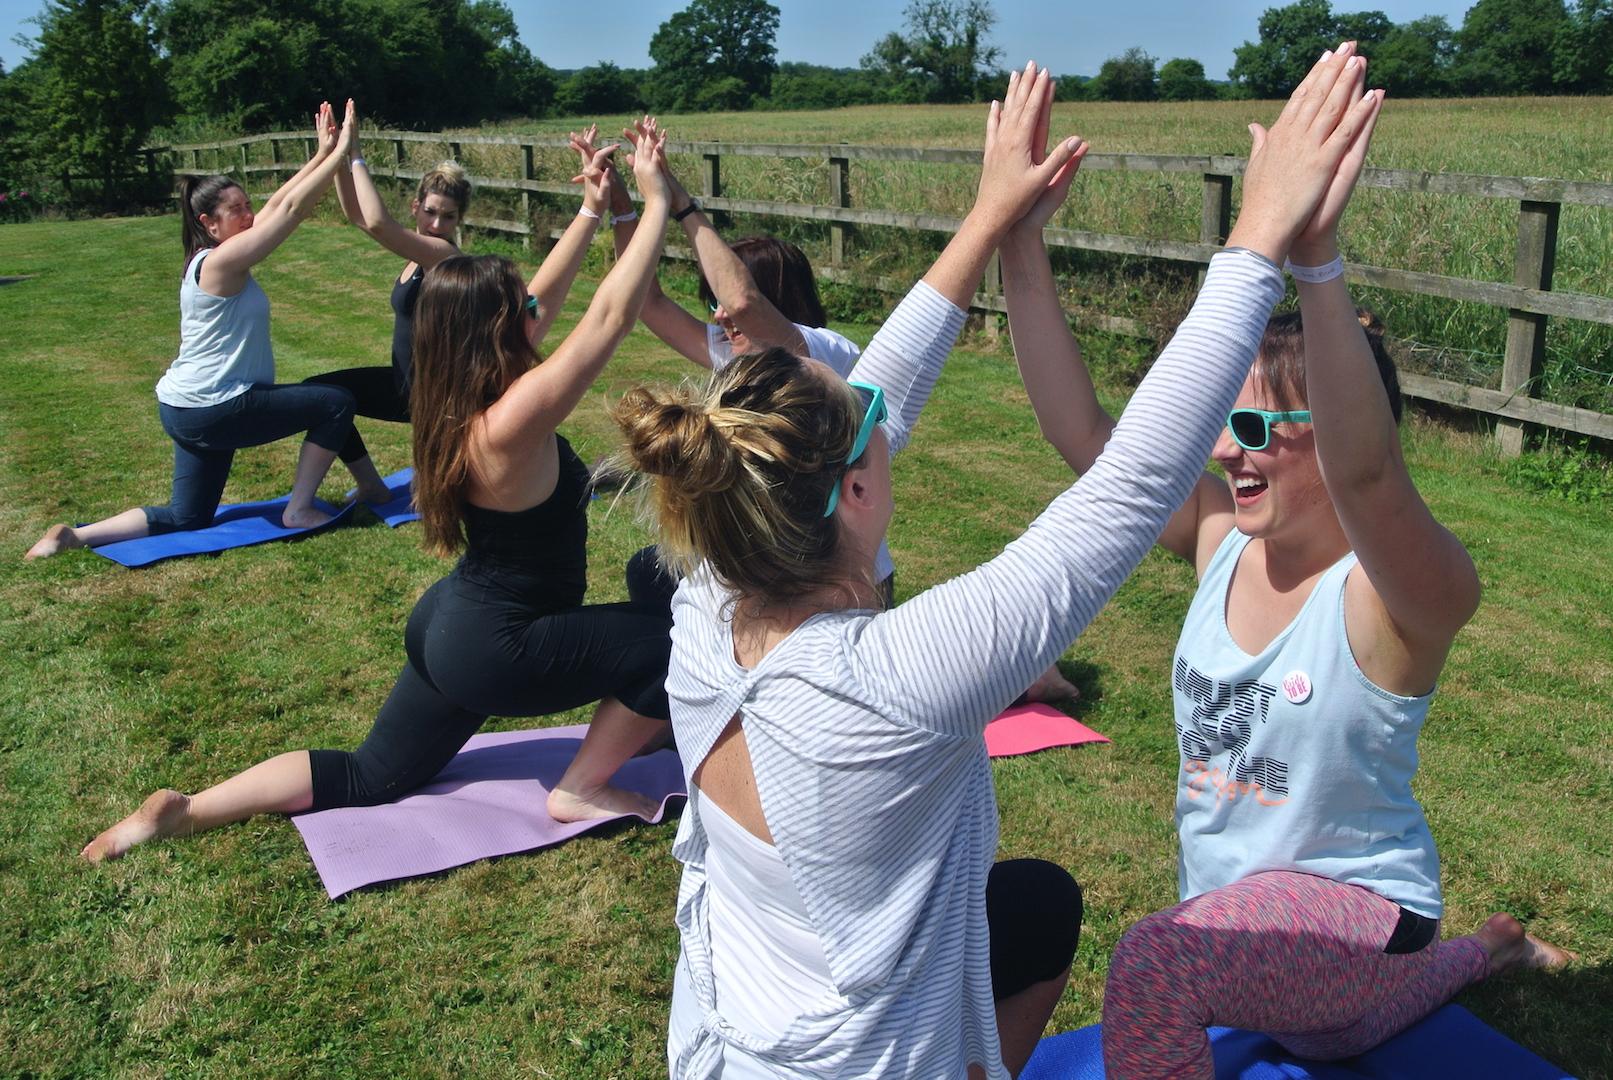 hen Partner yoga Bath Bristol